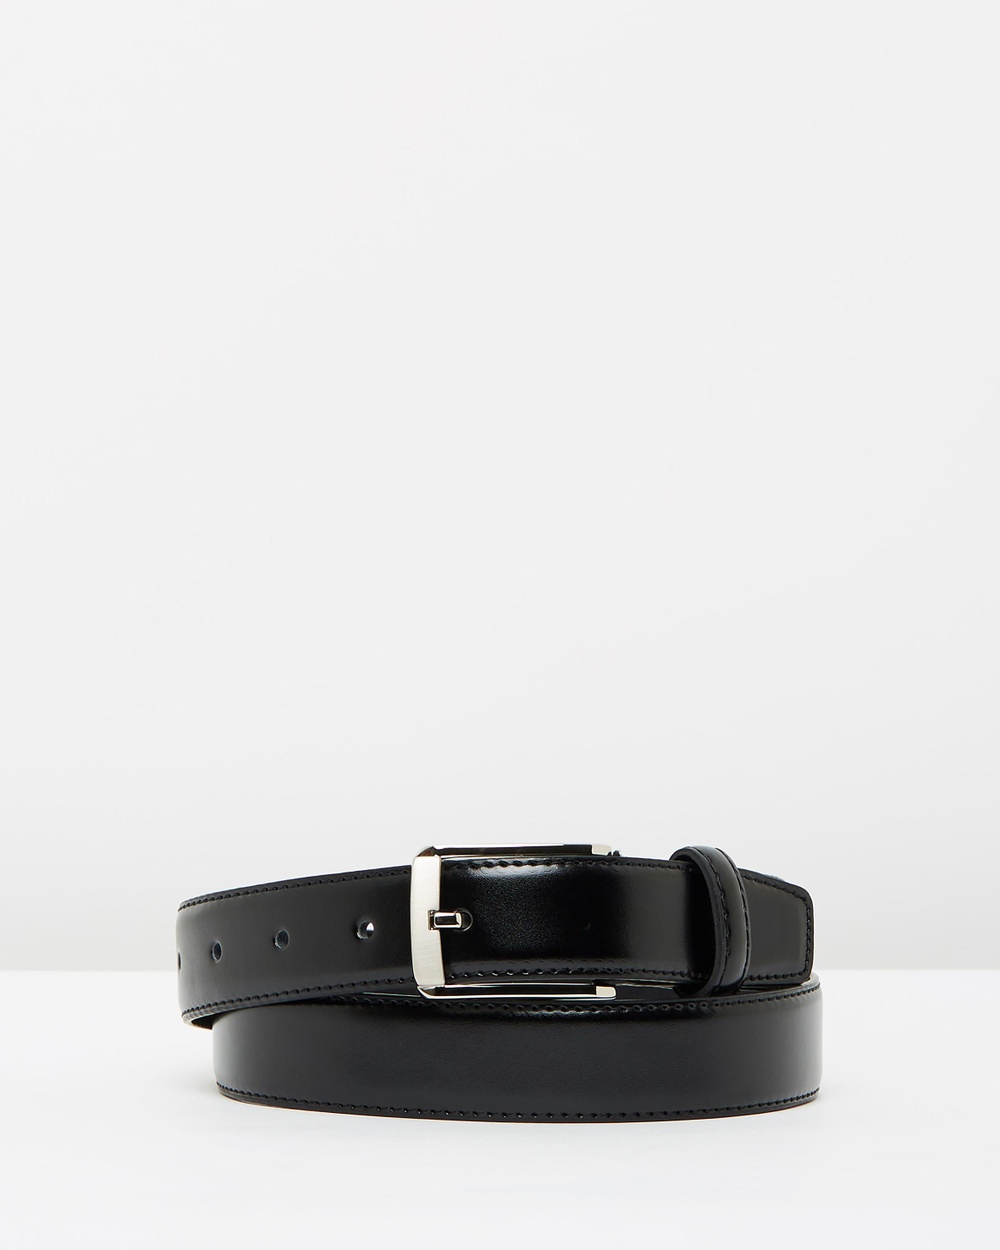 Buckle Toronto Leather Belt Belts Black